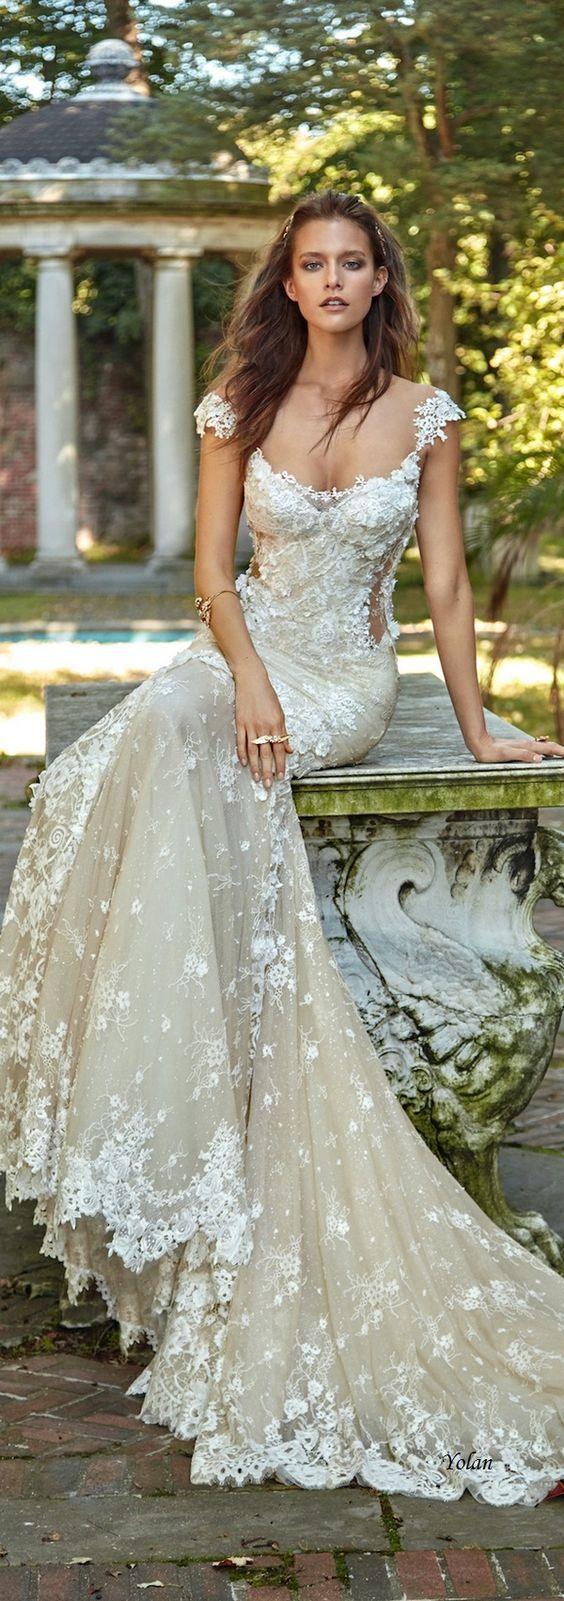 Galia lahav wedding dresses dress pinterest galia lahav